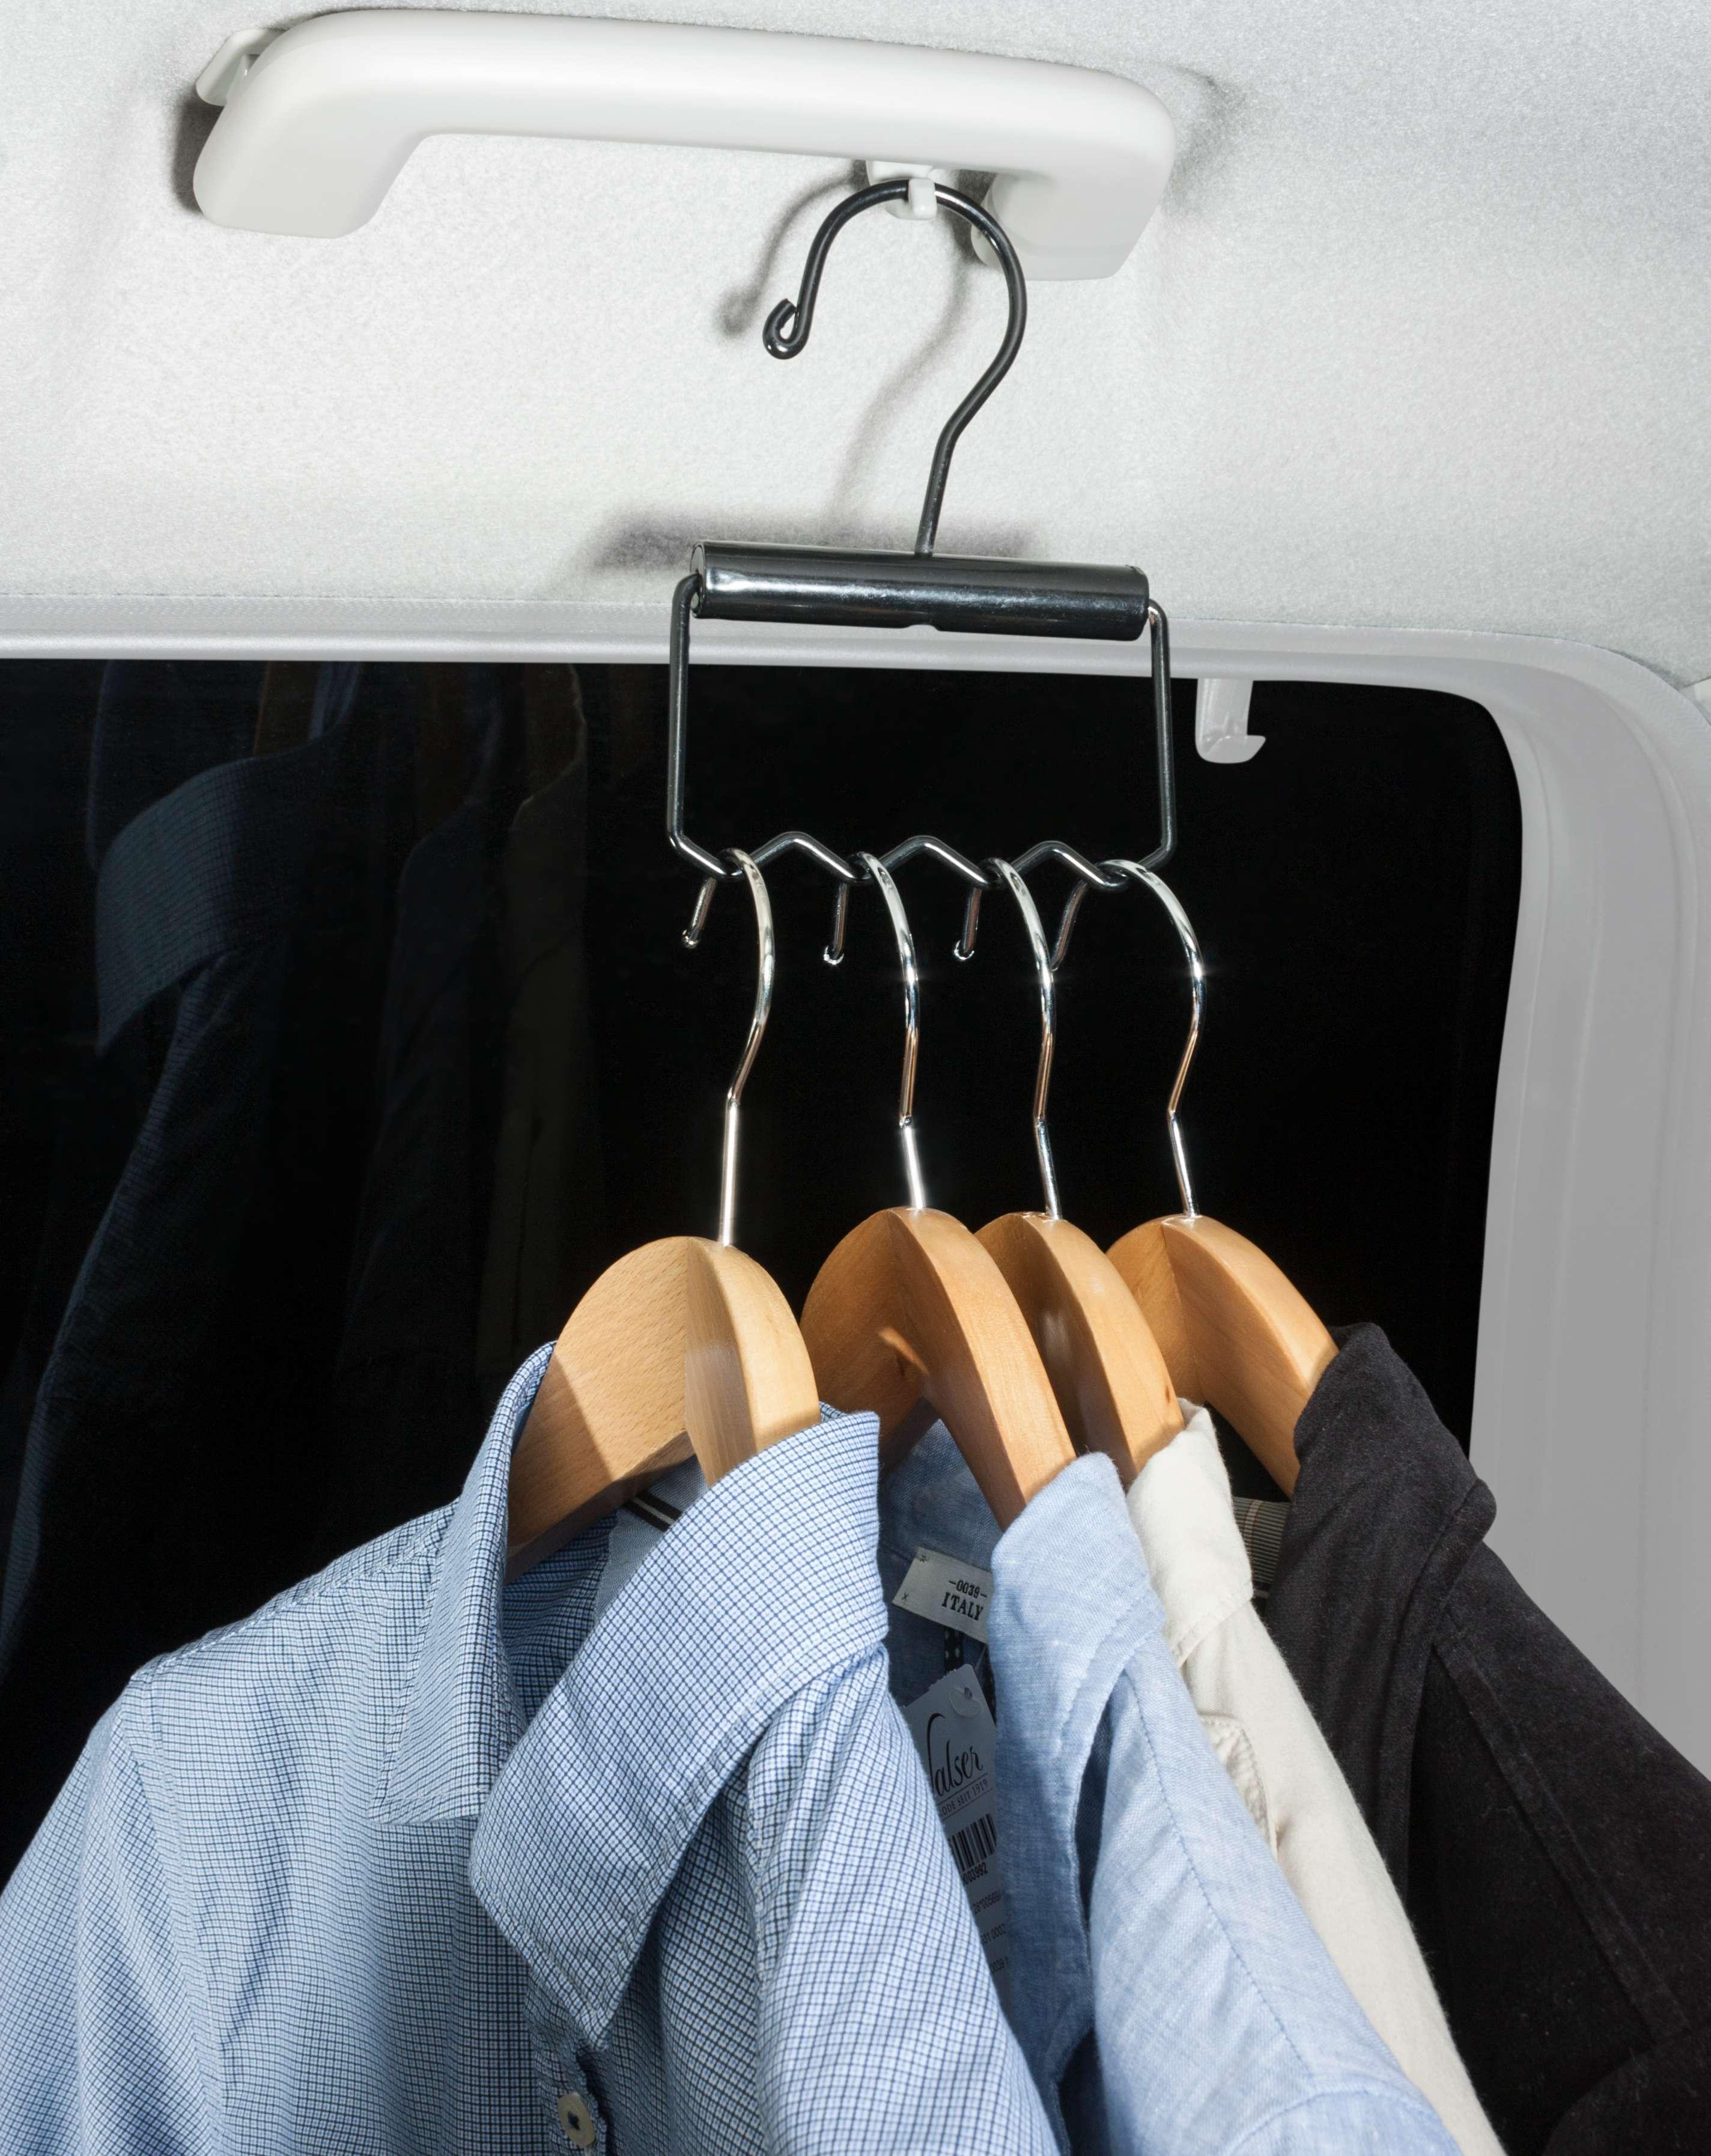 Coat hanger WALSER 30224 rating